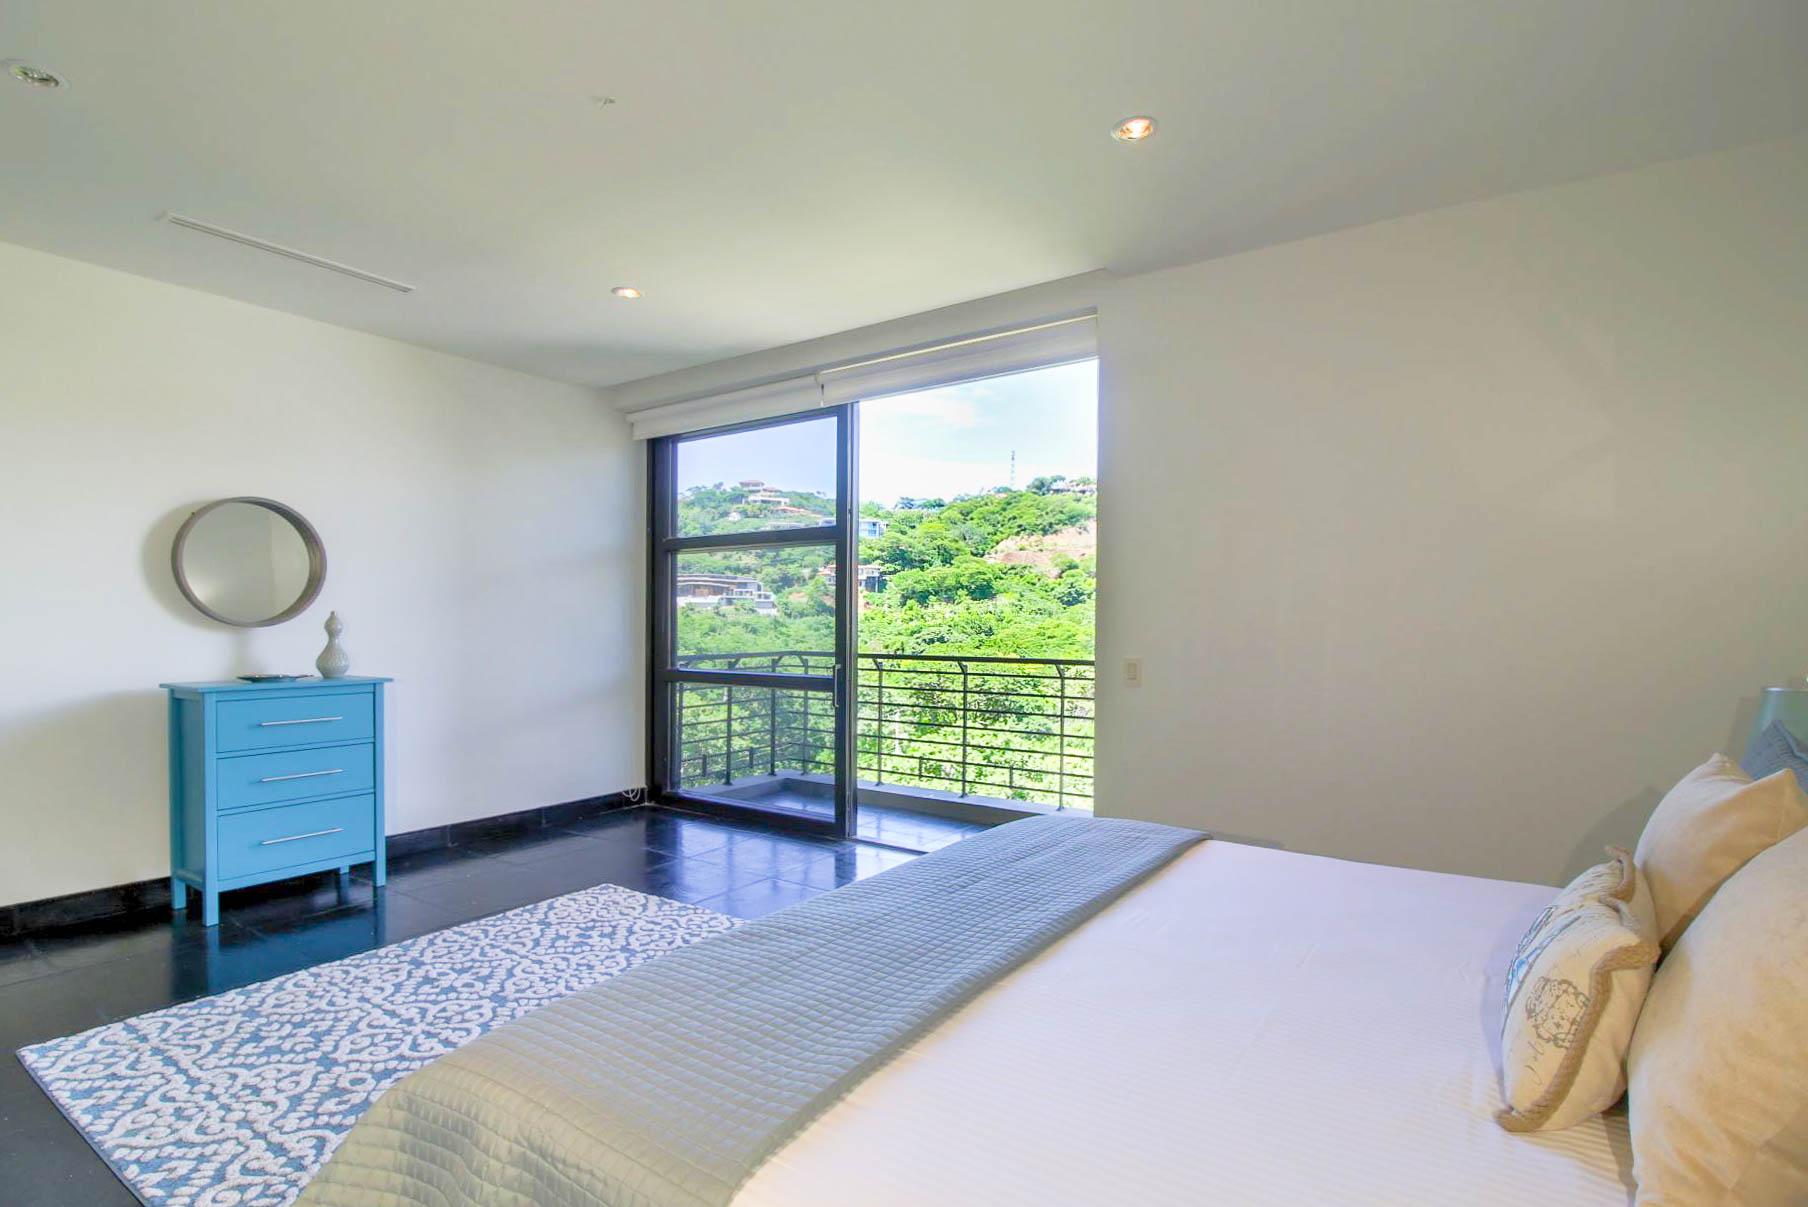 Floor to ceiling windows and sliding door to balcony